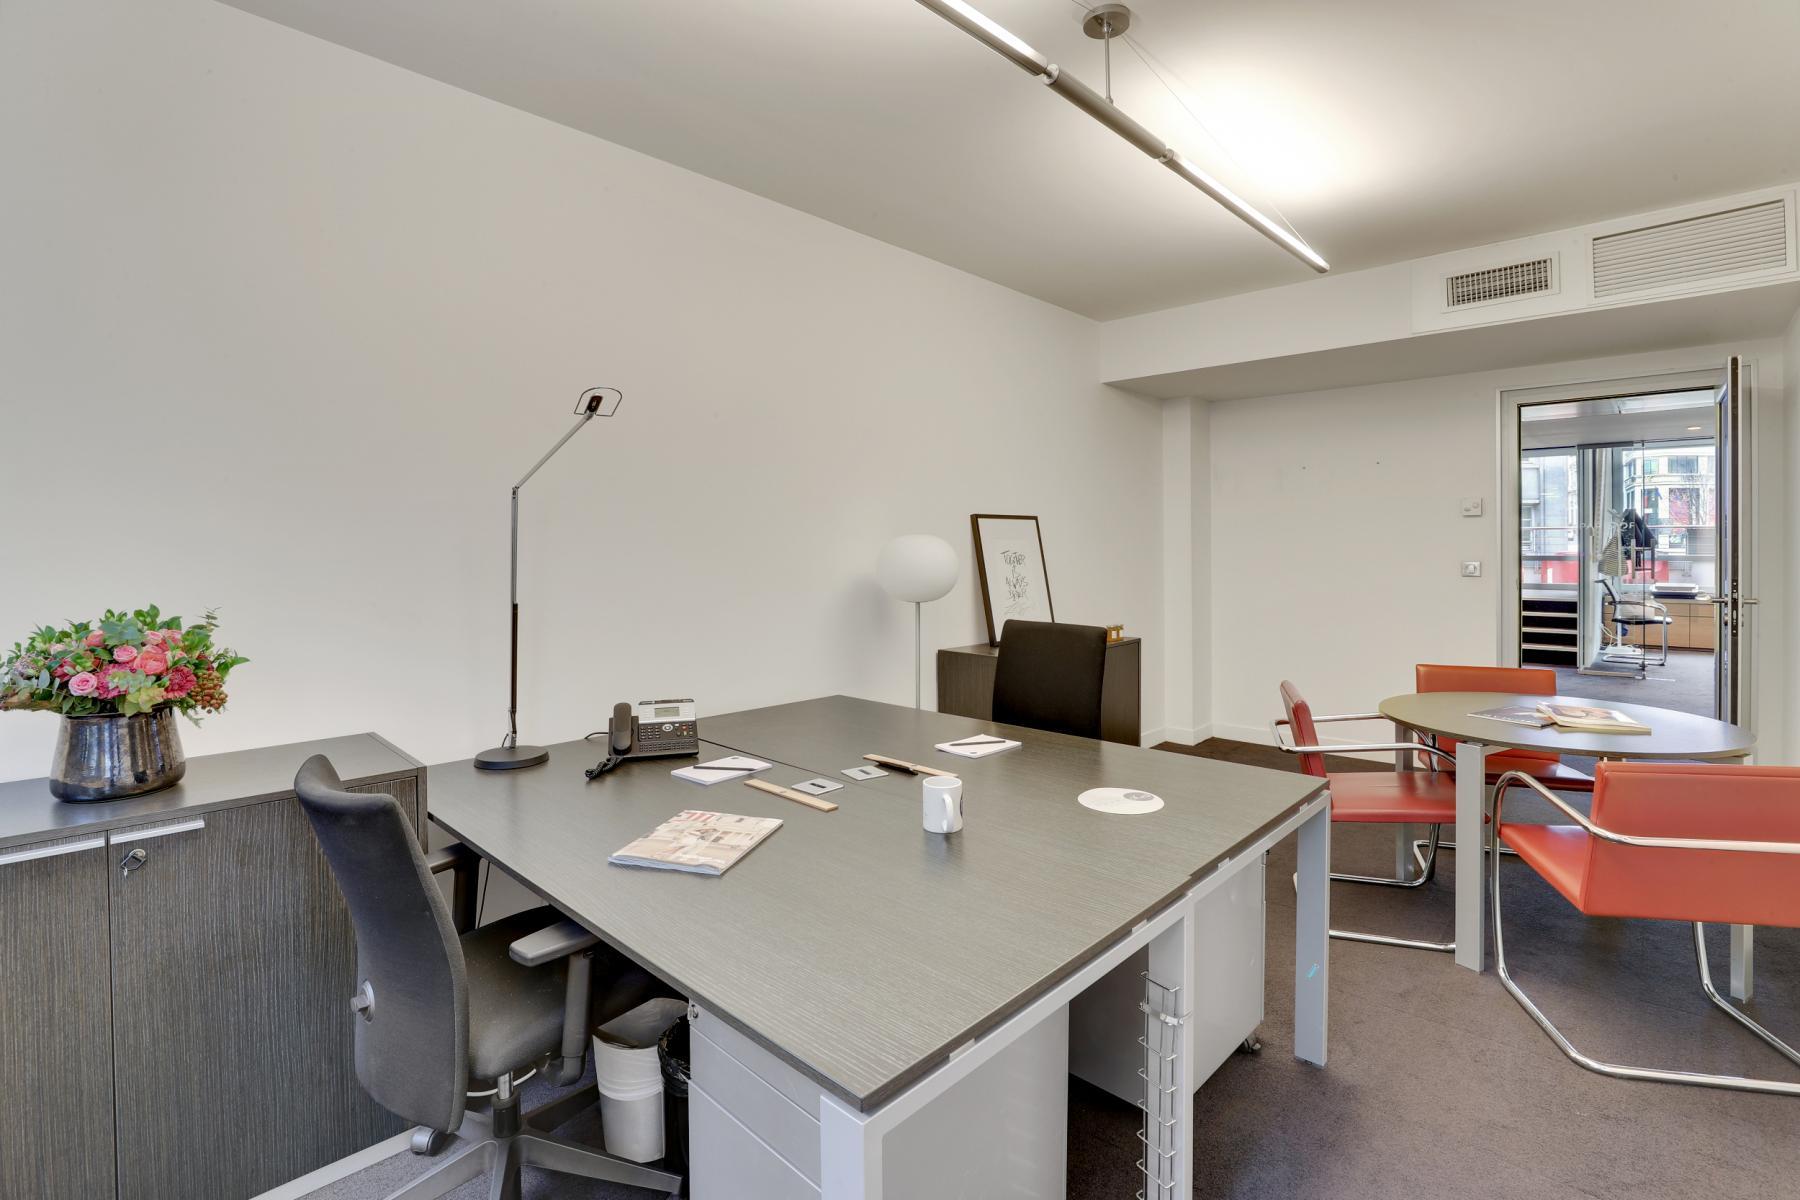 Location bureau Rue Quentin-Bauchart 20, Paris (12)